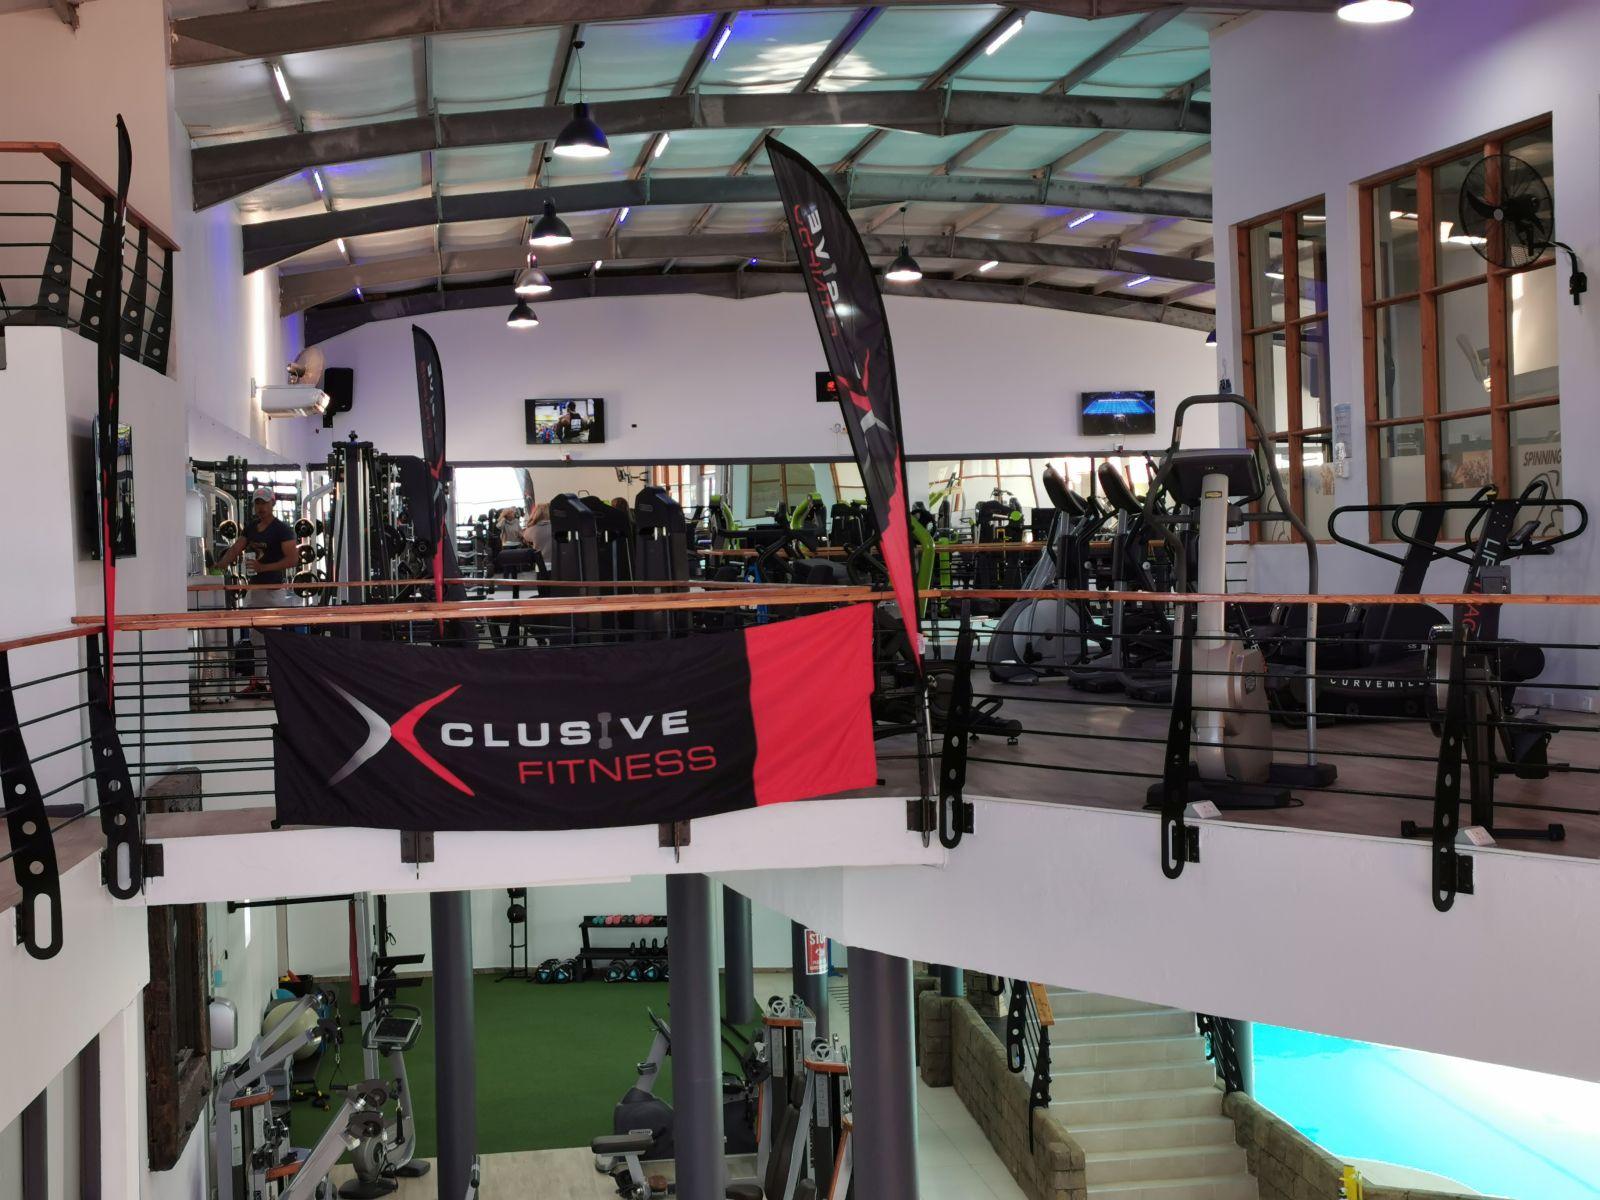 Xclusive Fitness Img 20200828 125042